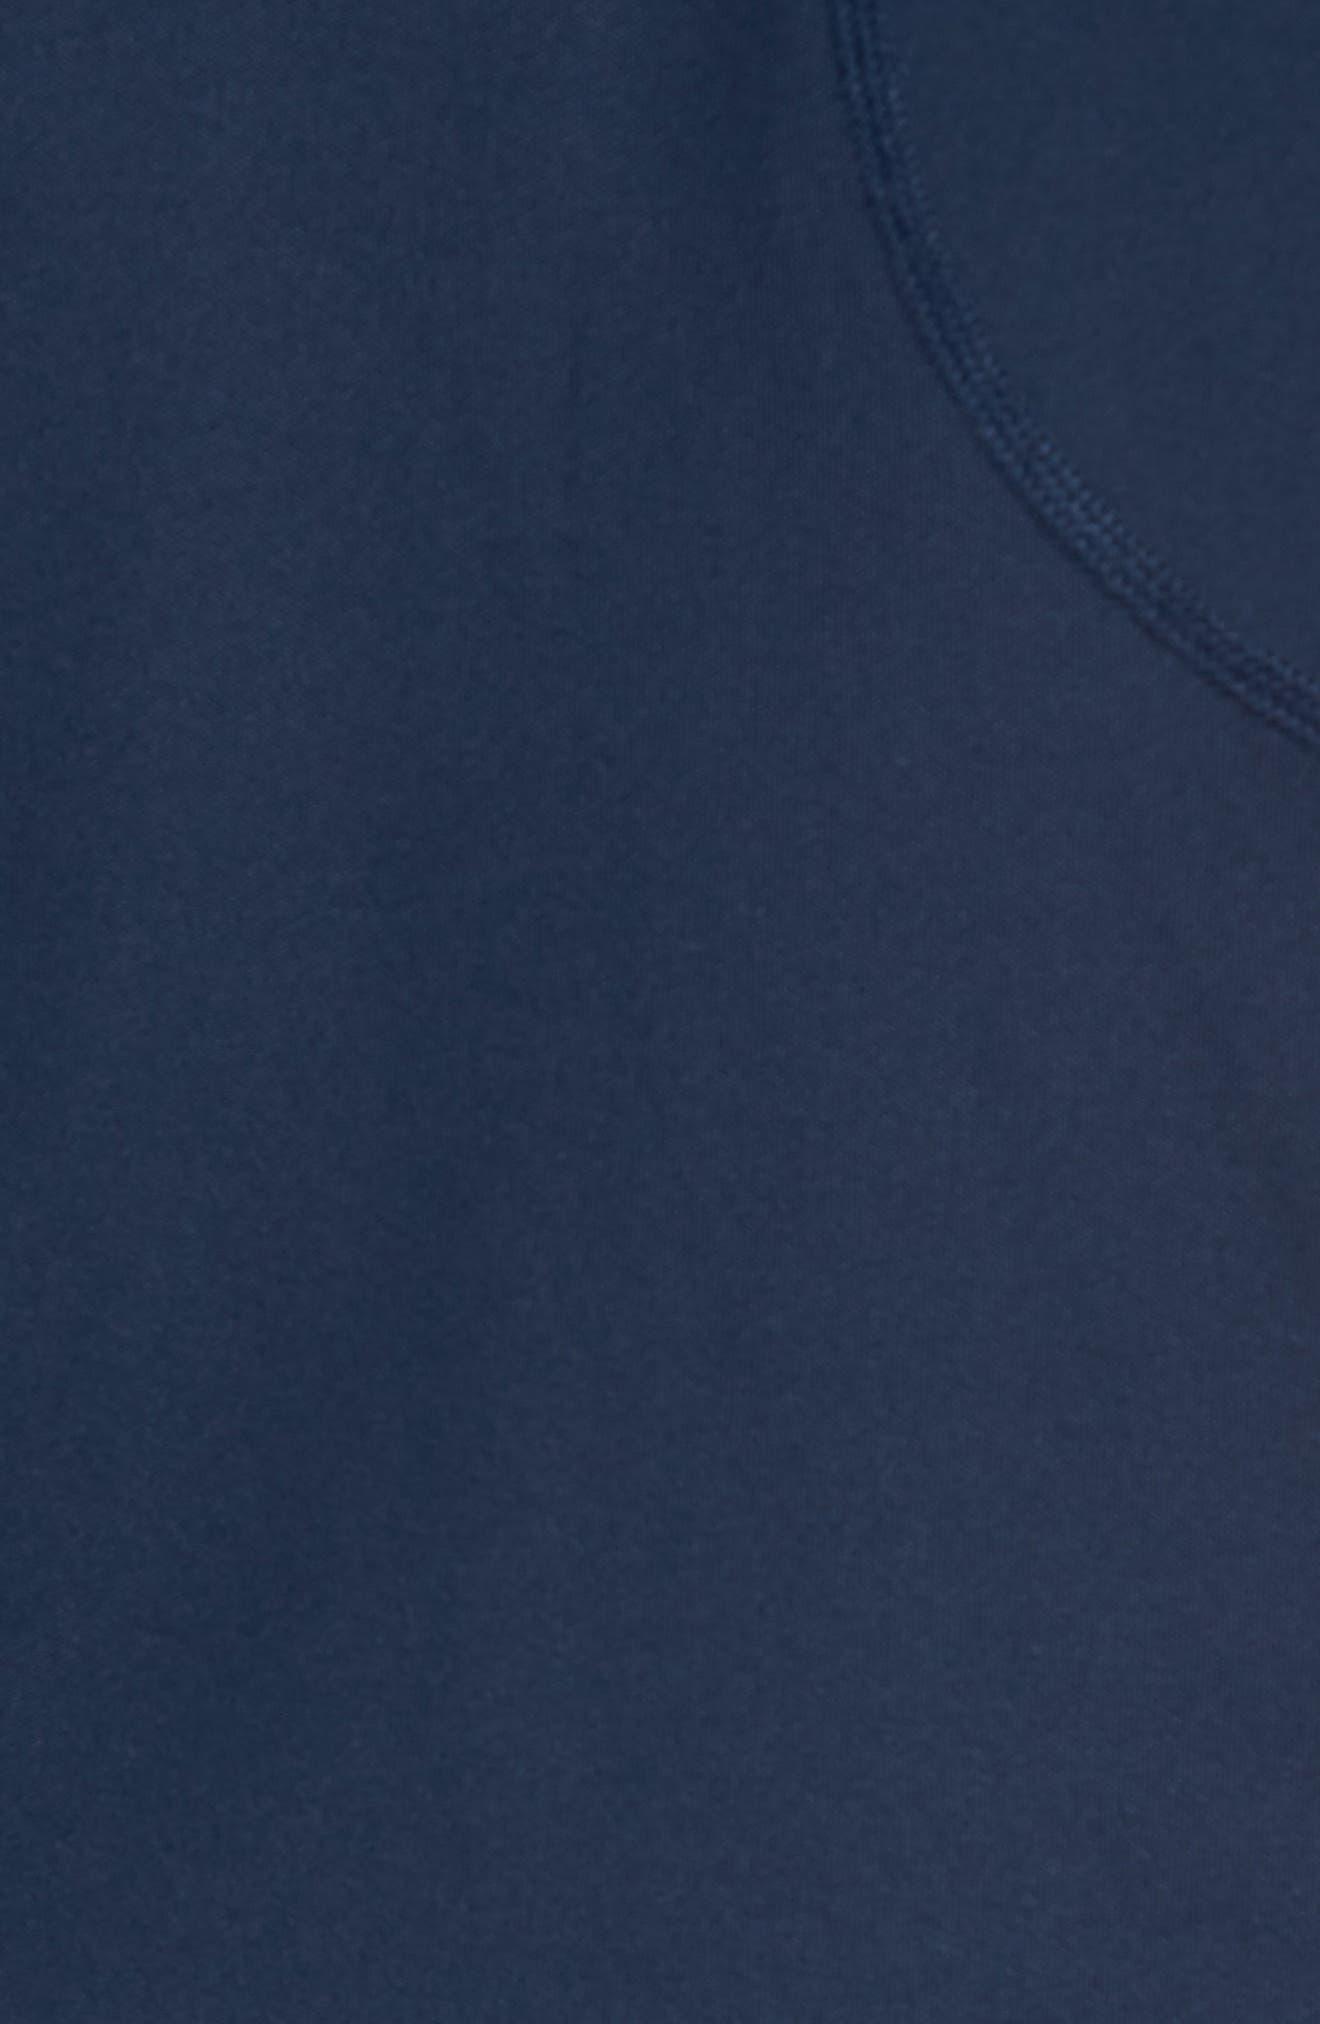 M-Flex Flatiron Slim Fit Golf Polo,                             Alternate thumbnail 5, color,                             Navy